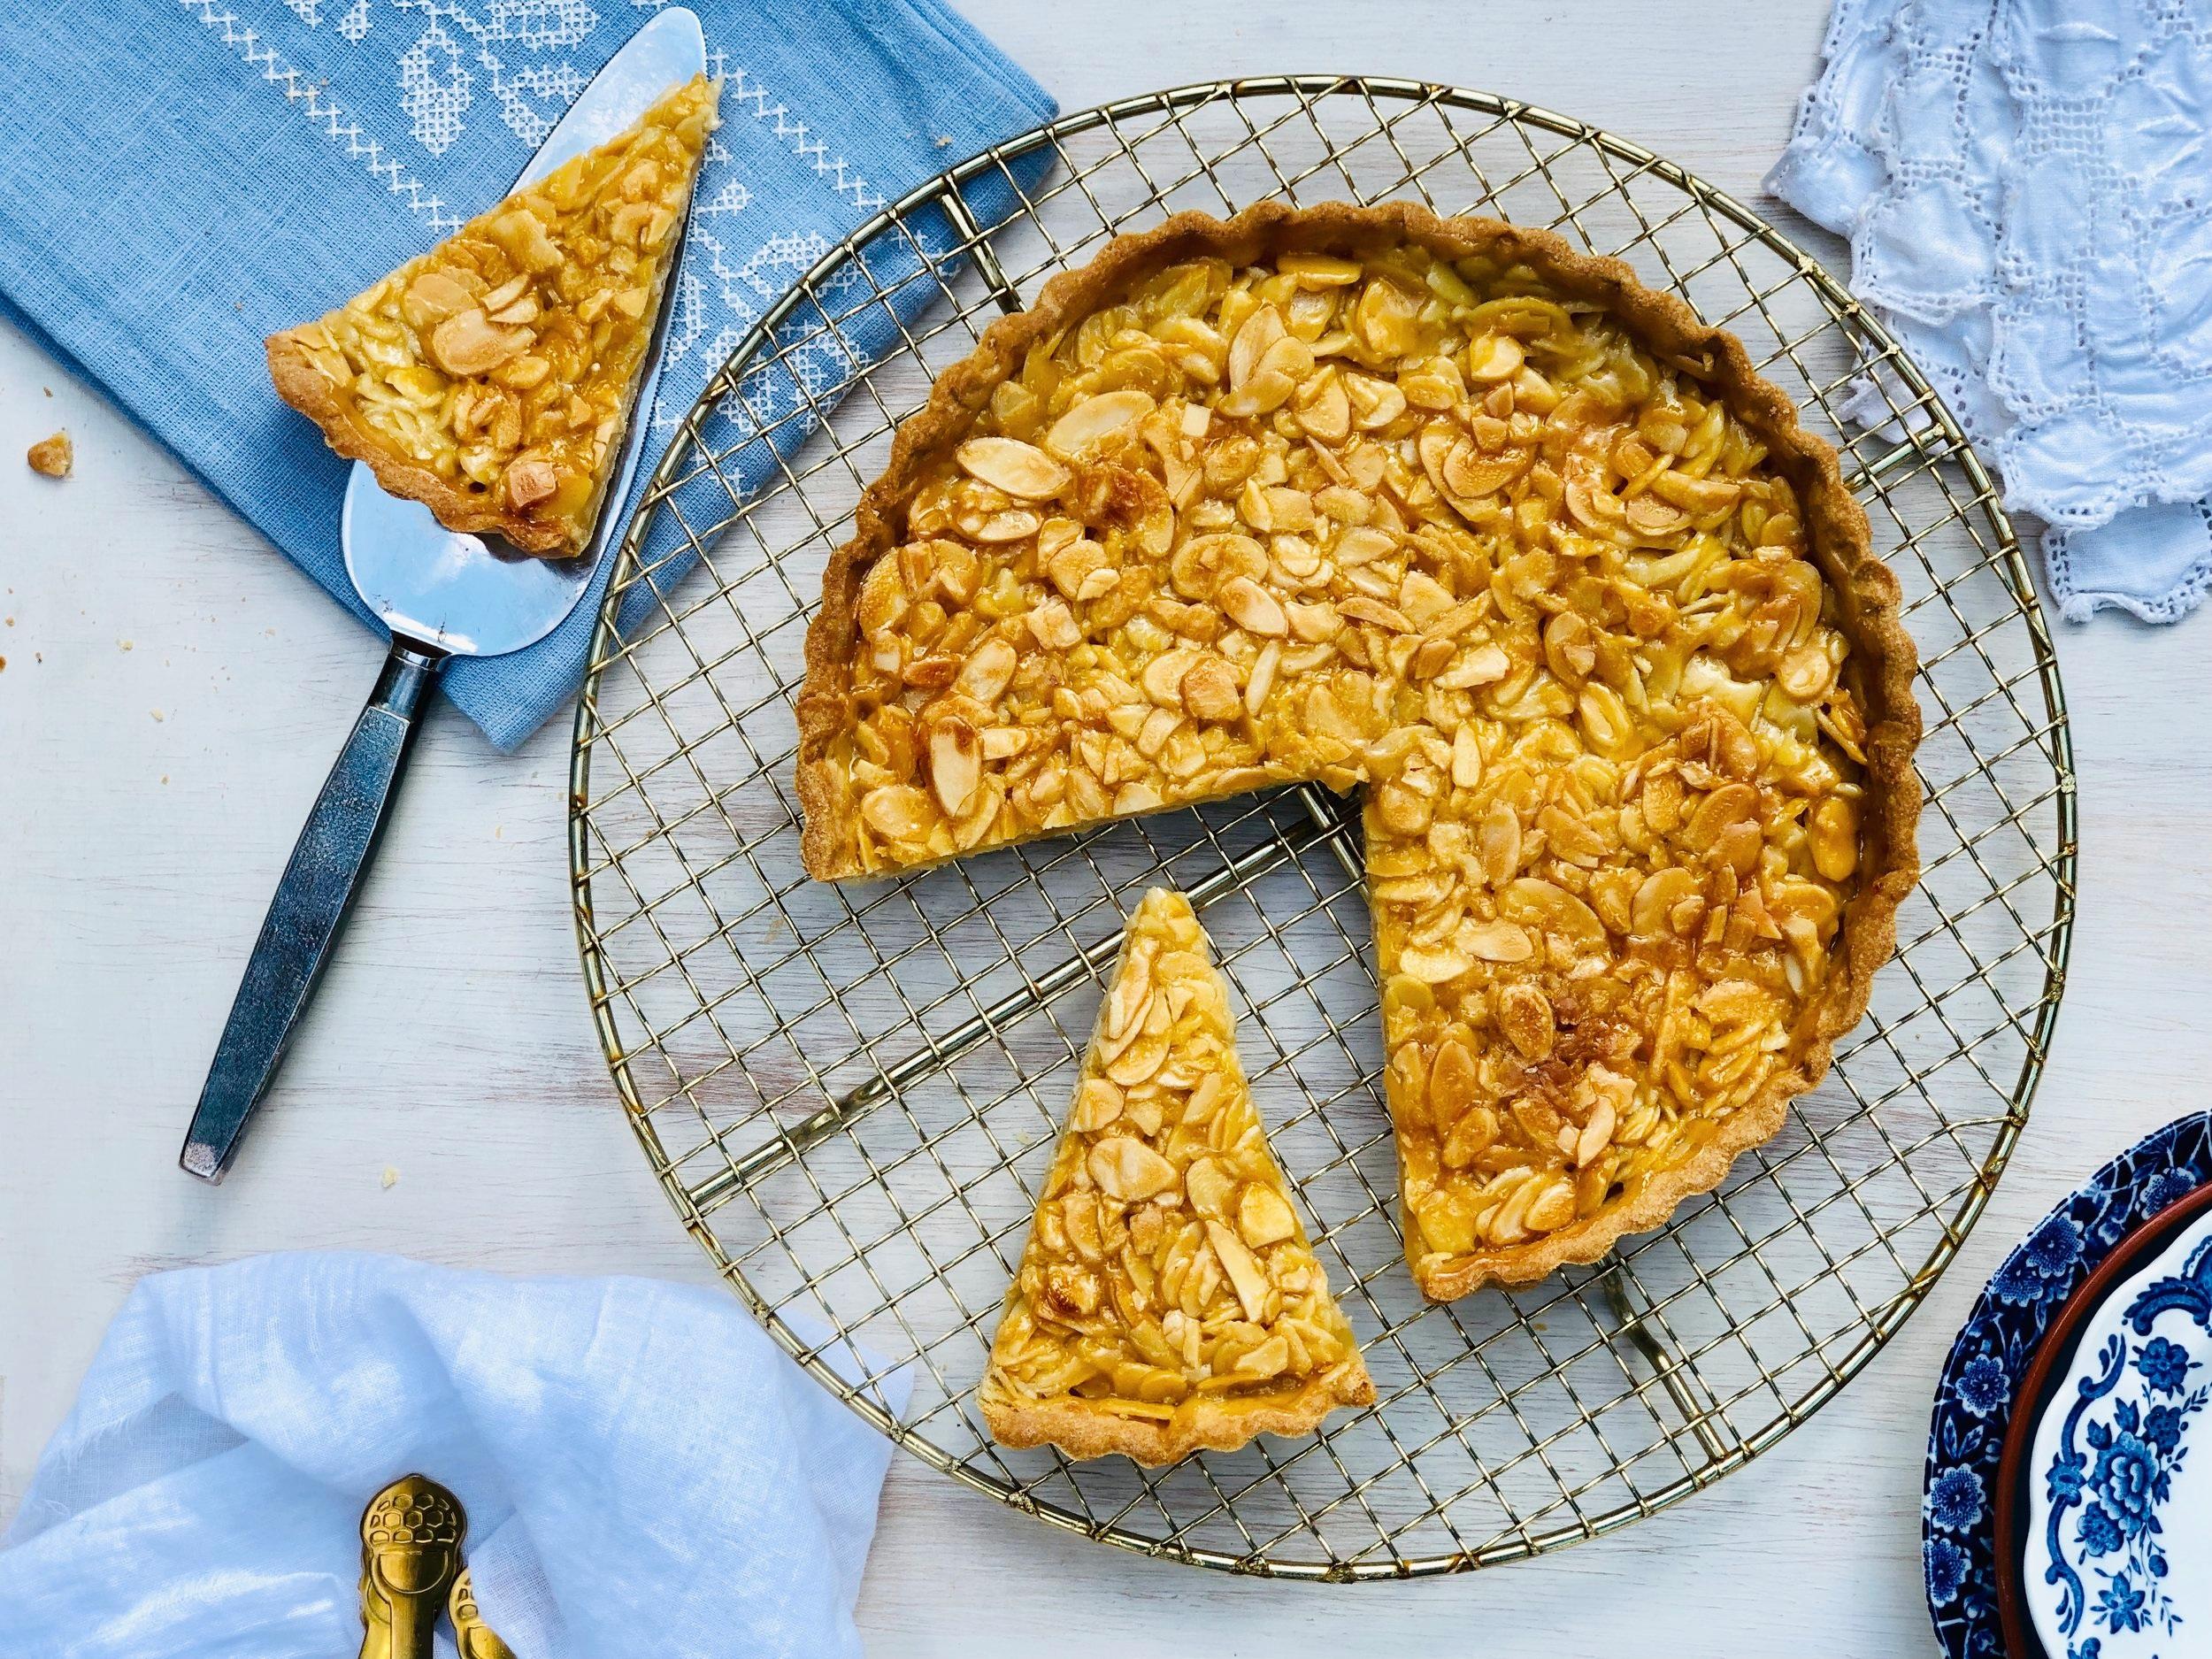 Portuguese Style Caramelised Almond Tart 1.jpg